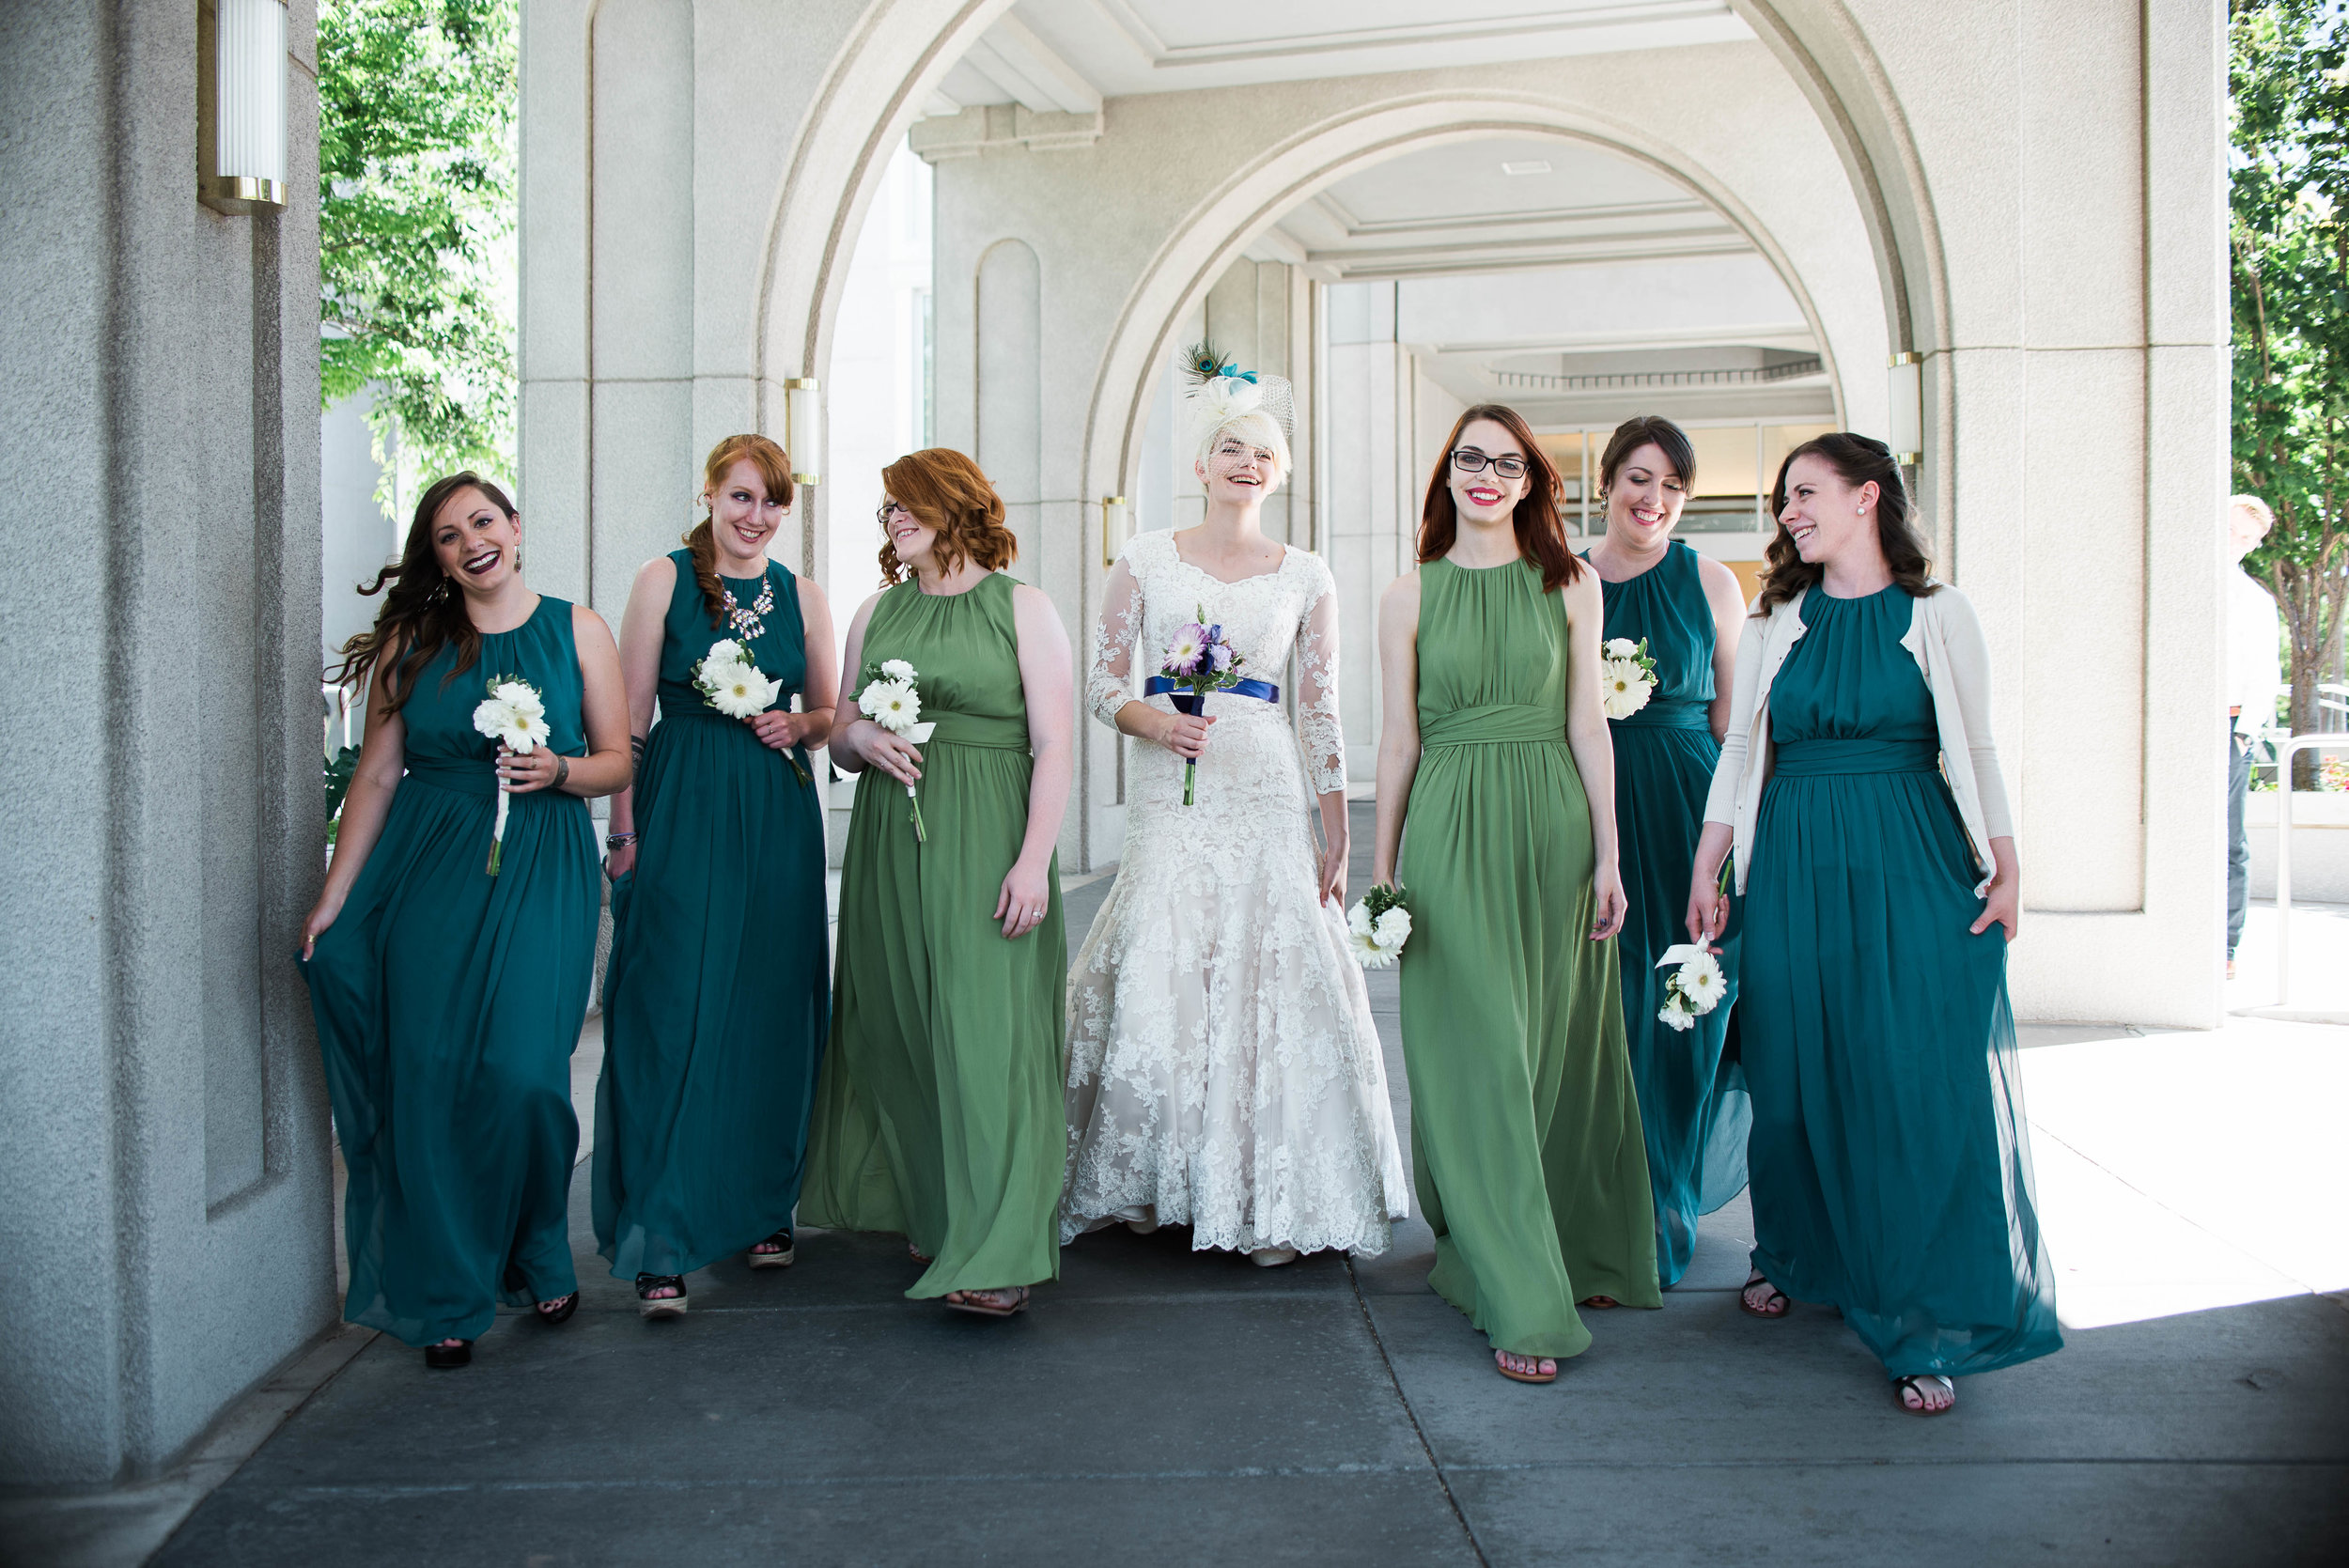 K+M-Wedding-DaySadie_Banks_Photography-369.jpg